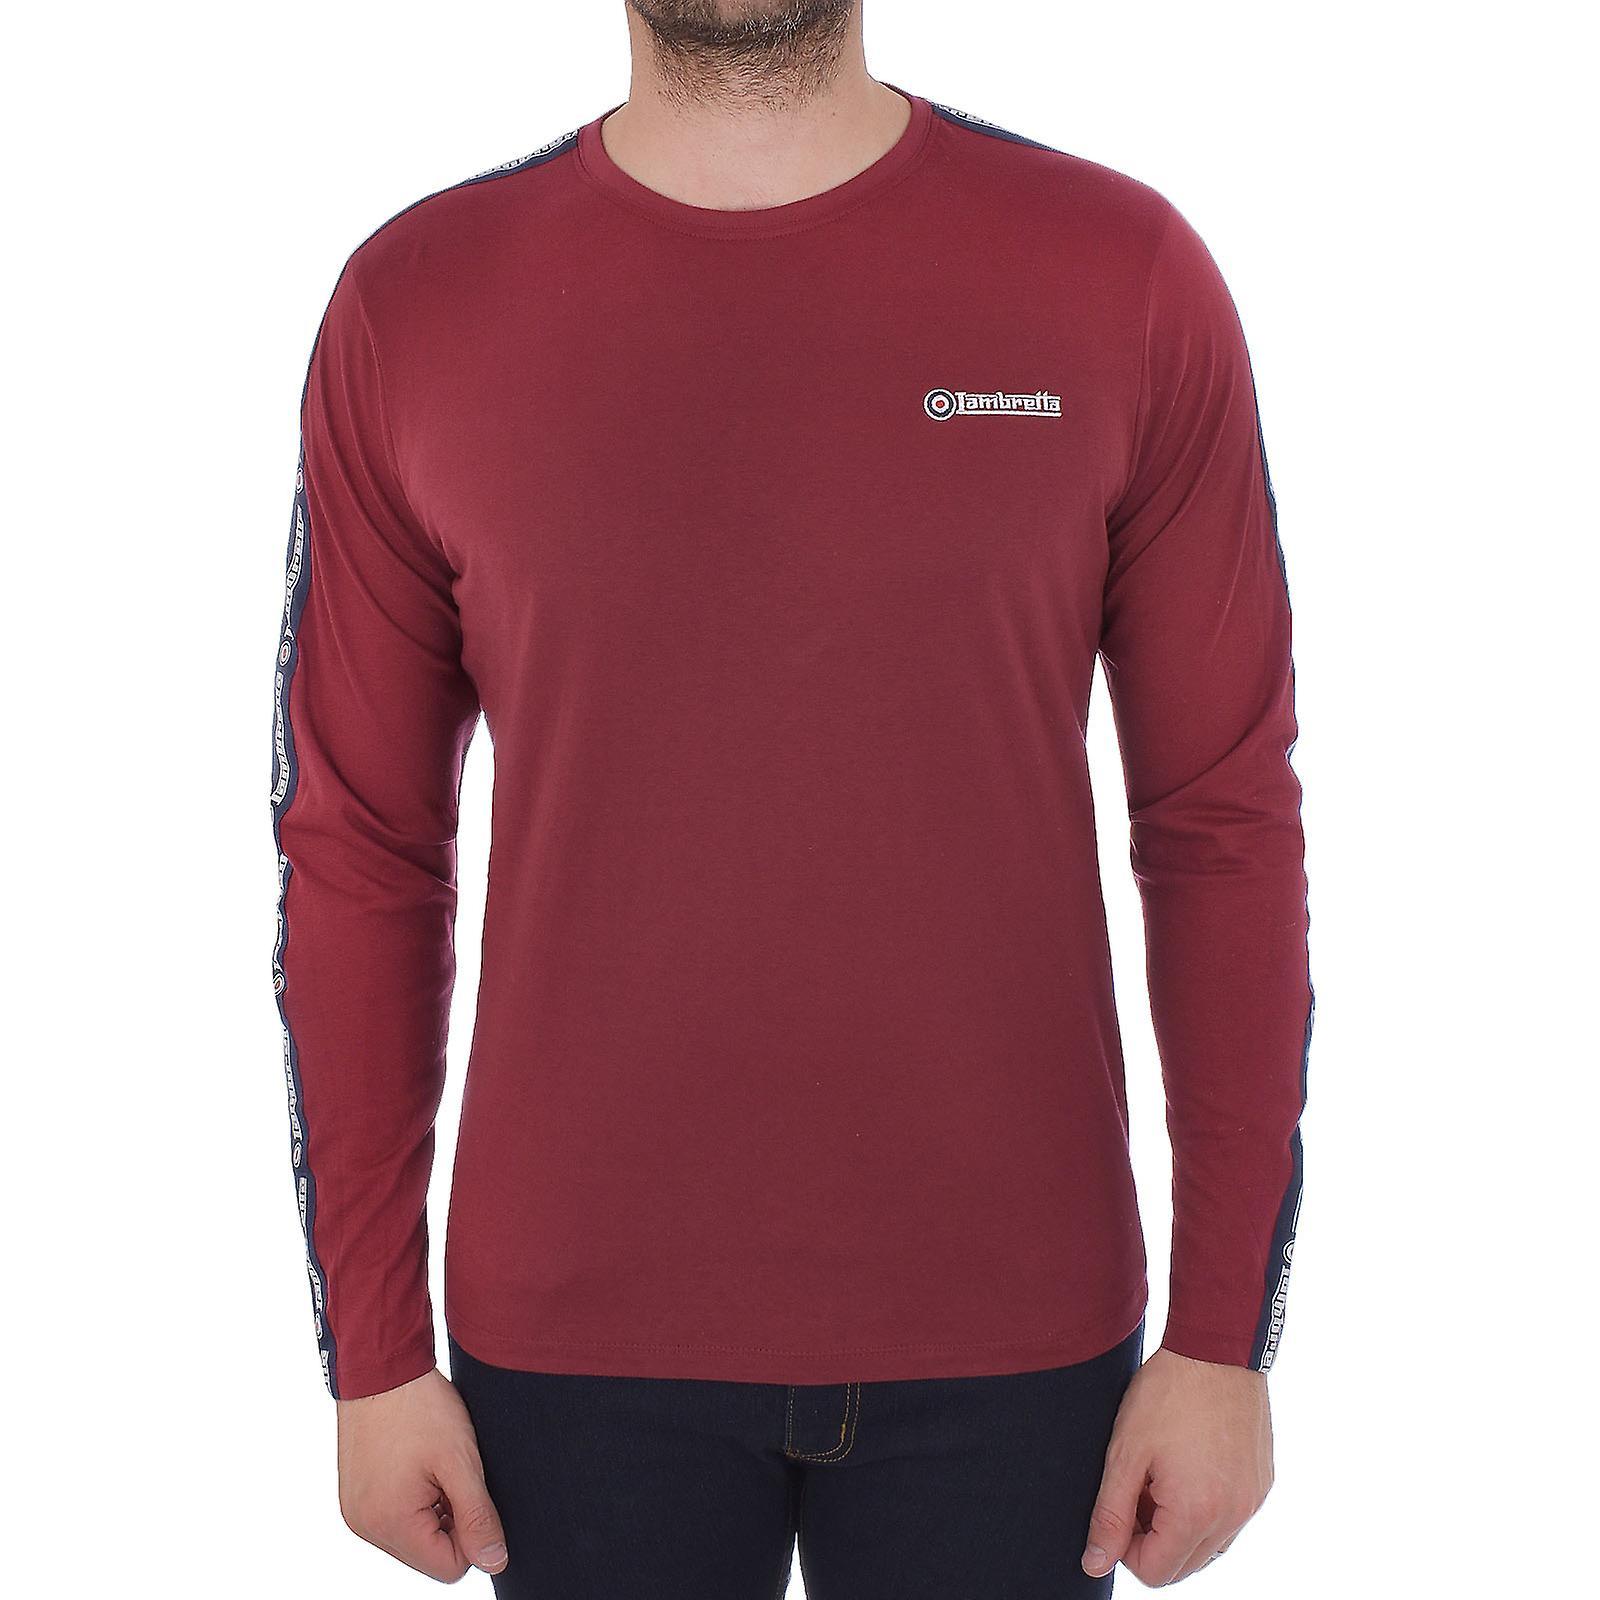 4f9b47d1d5d744 Lambretta Herren Langarm mit Klebeband Baumwolle Rundhals lässige T-Shirt T-Shirt  Top